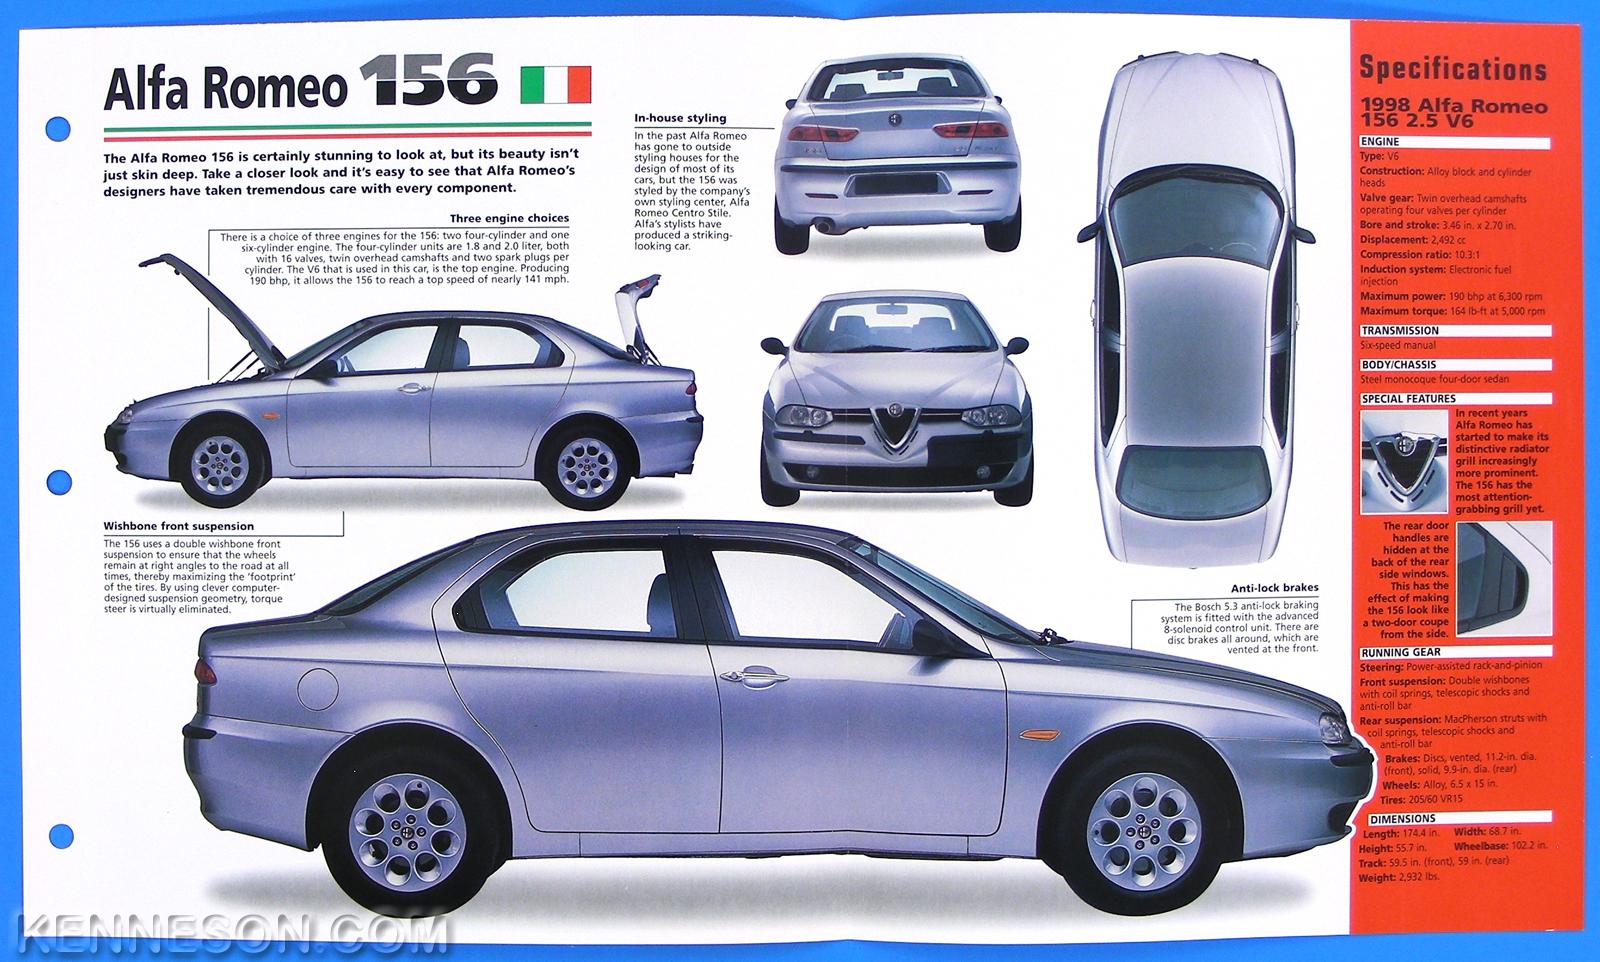 Alfa Romeo Italy Spec Sheet Brochure Poster IMP Hot - Alfa romeo poster